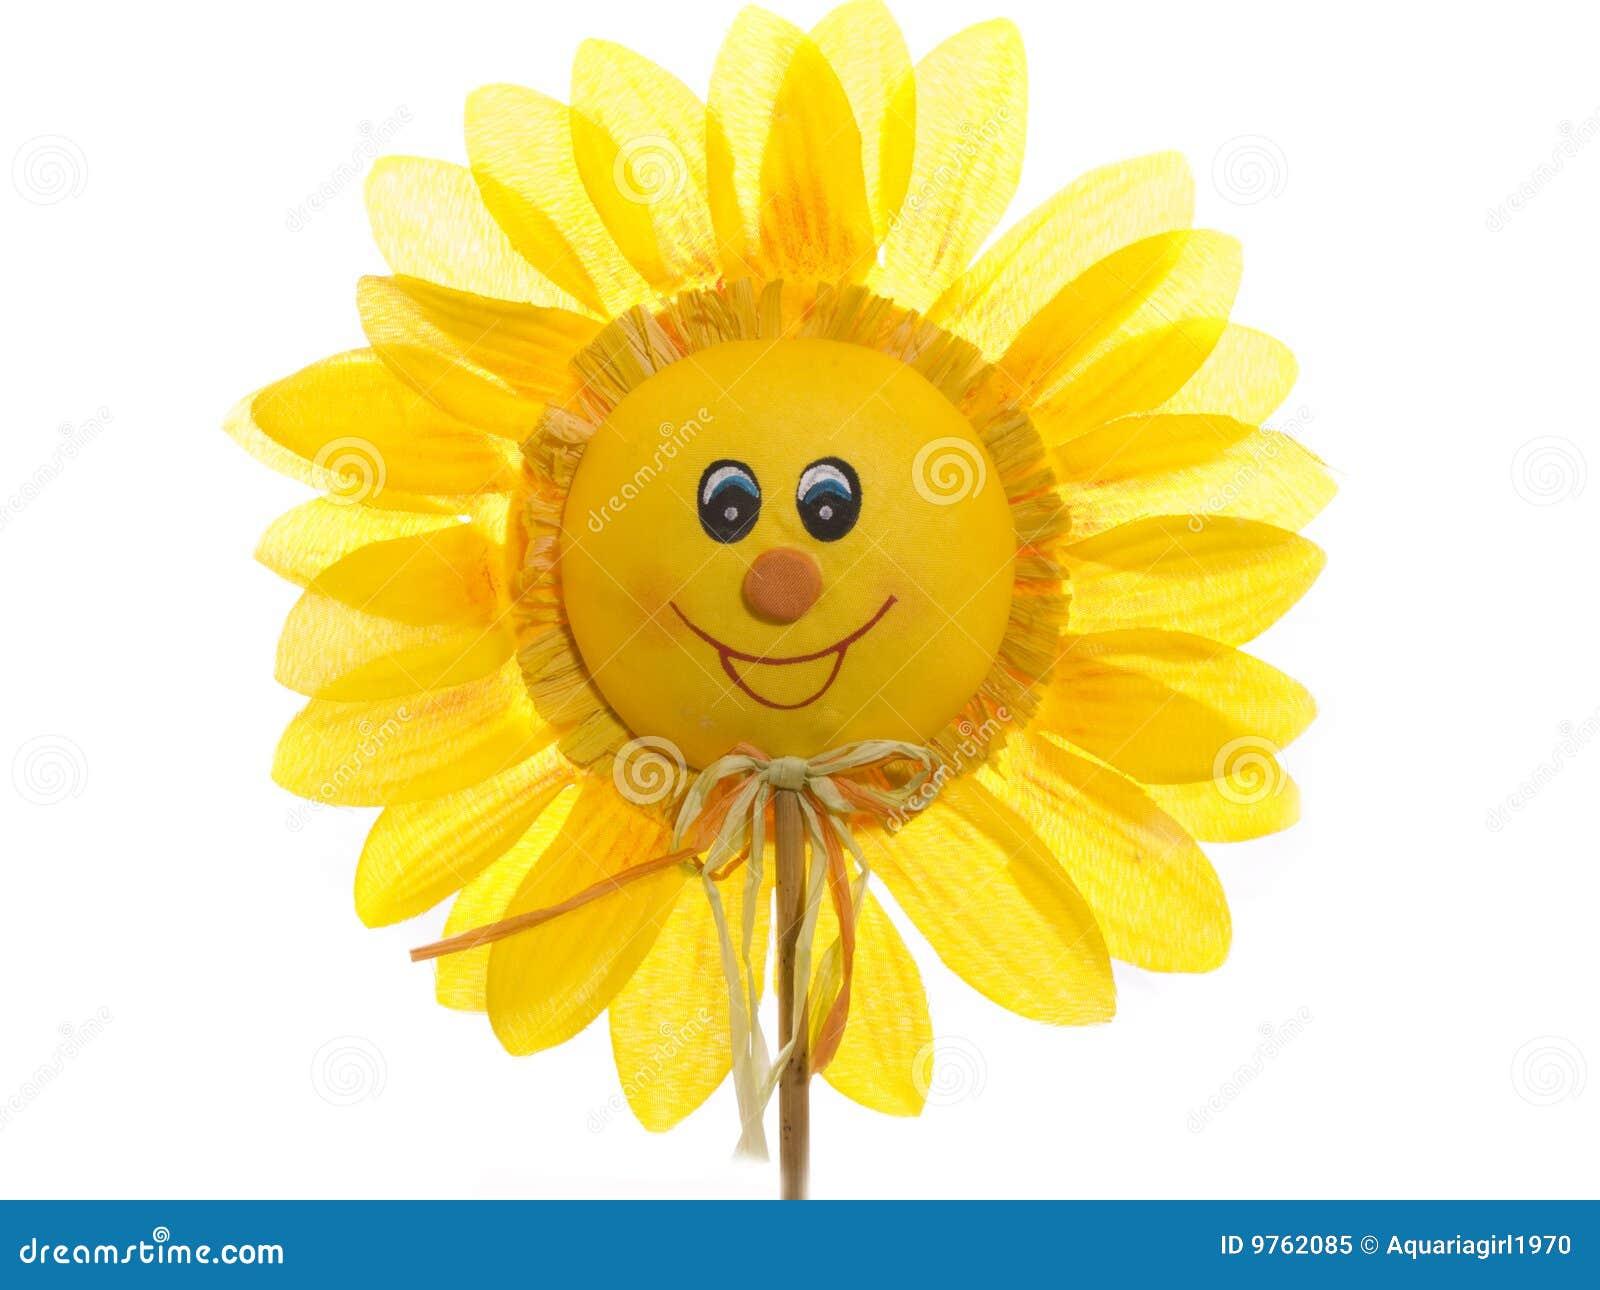 Happy Sunflower Royalty Free Stock Photo - Image: 9762085